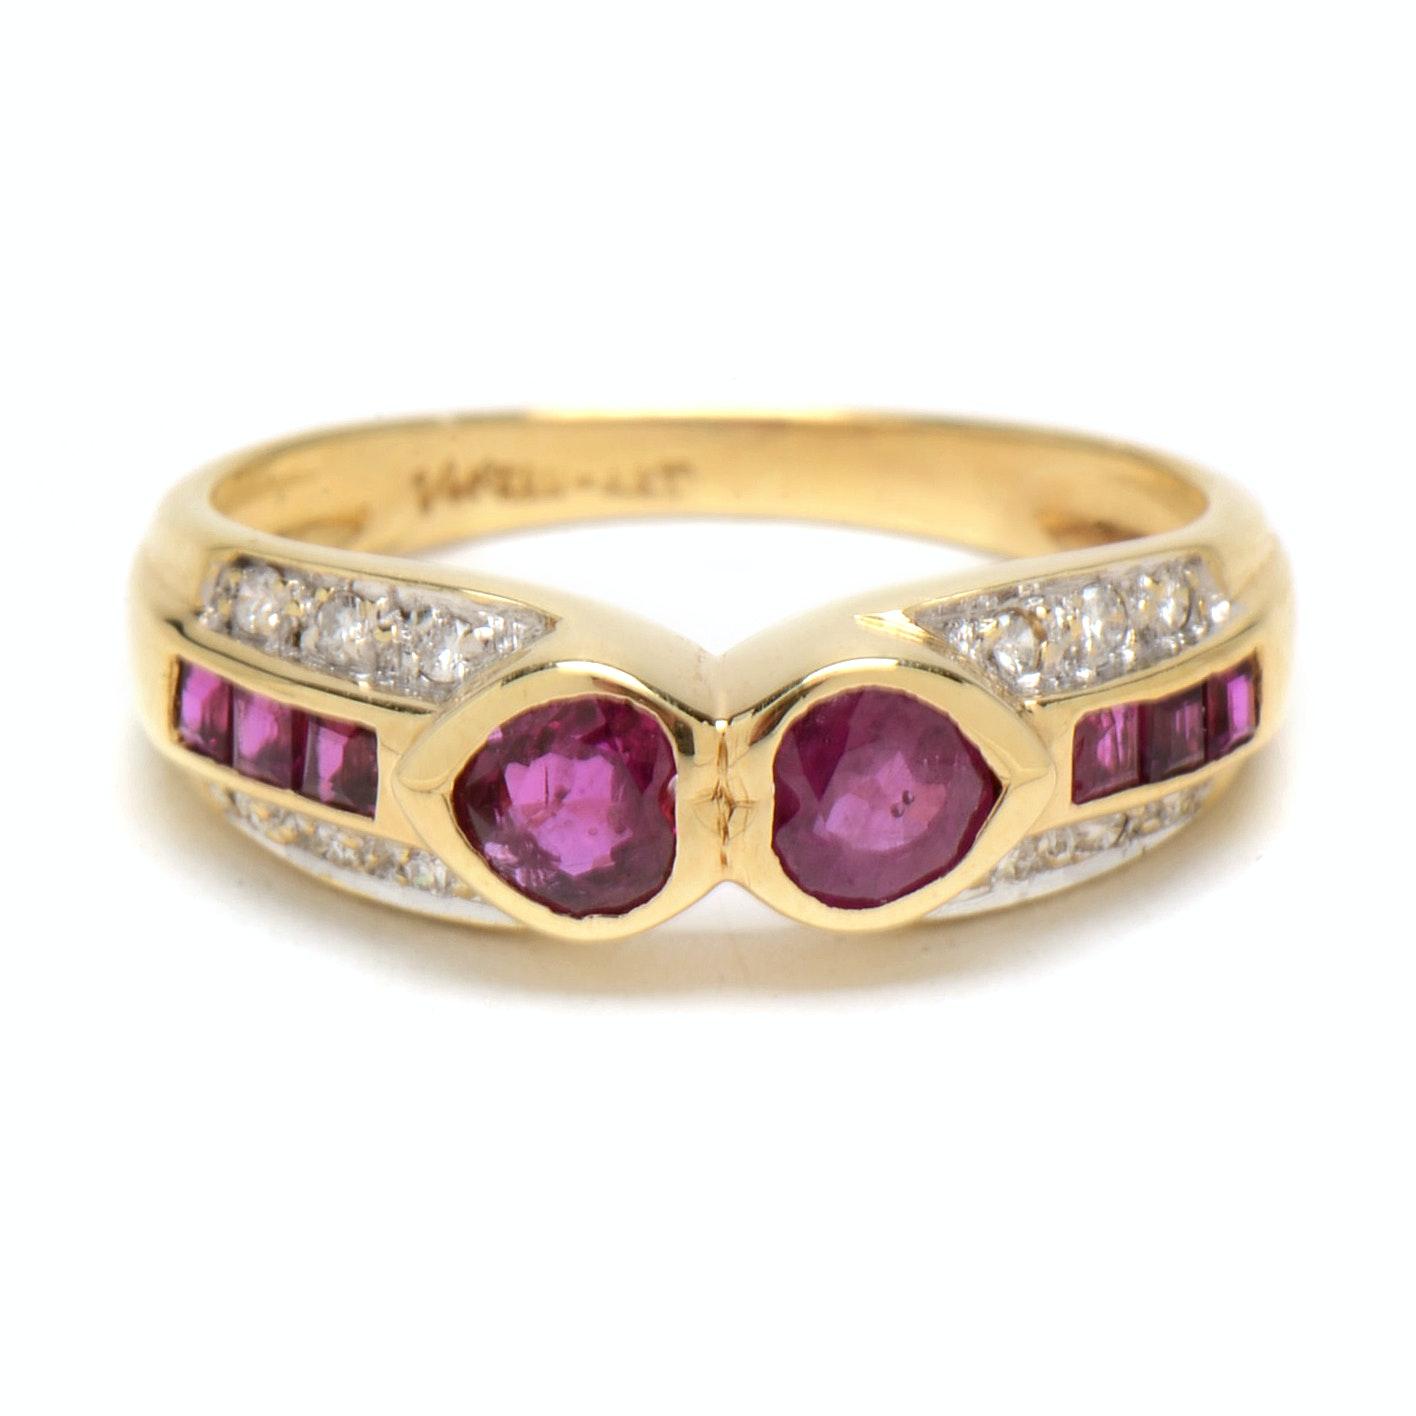 14K Yellow Gold Natural Ruby Diamond Ring